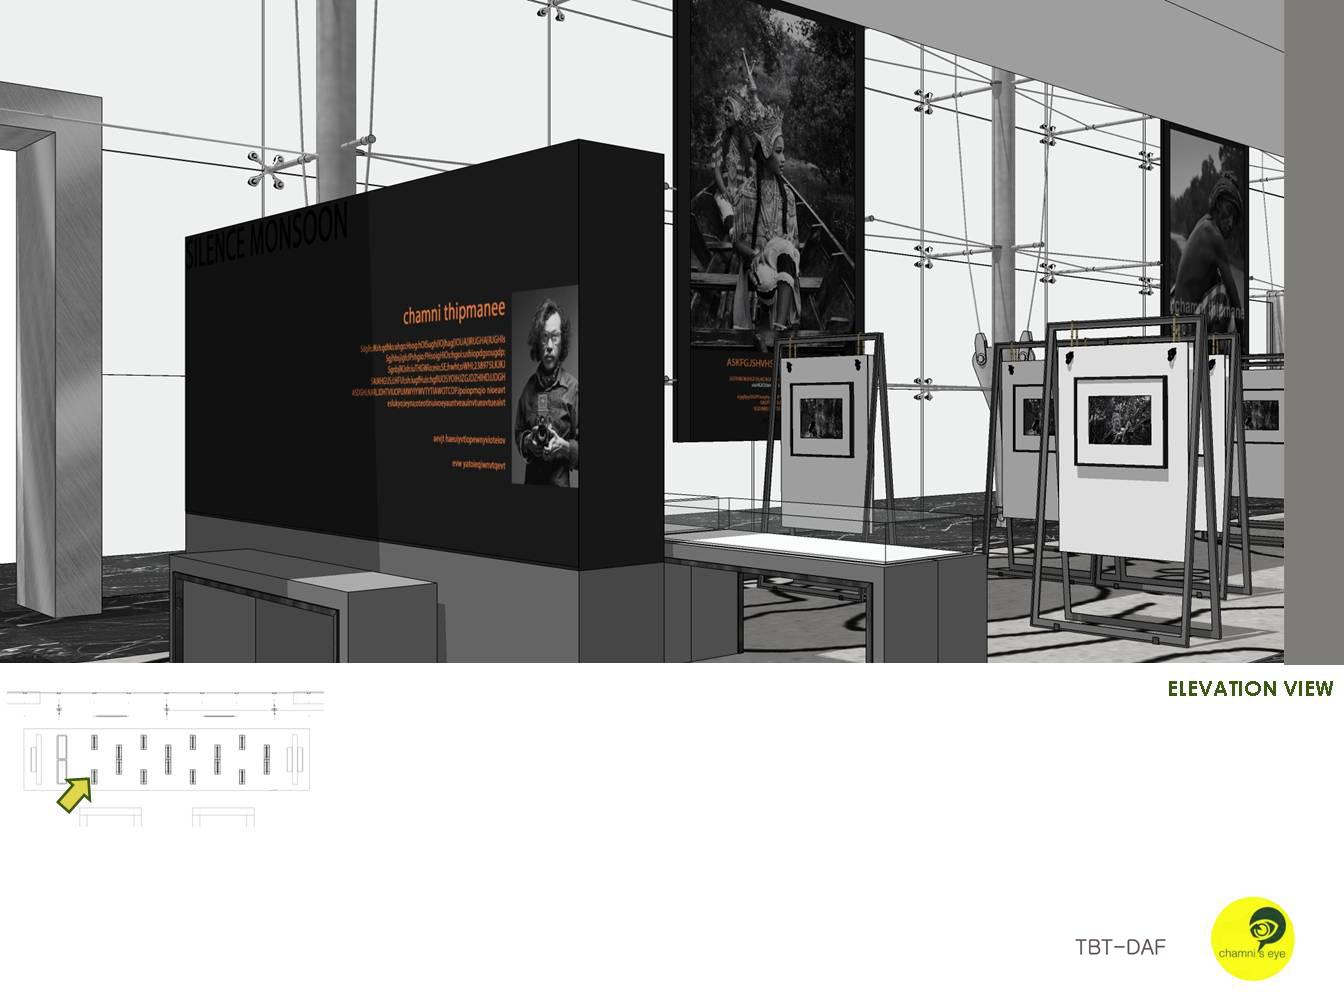 TBT-DAF interior design monsoon exhibition bw photo 17